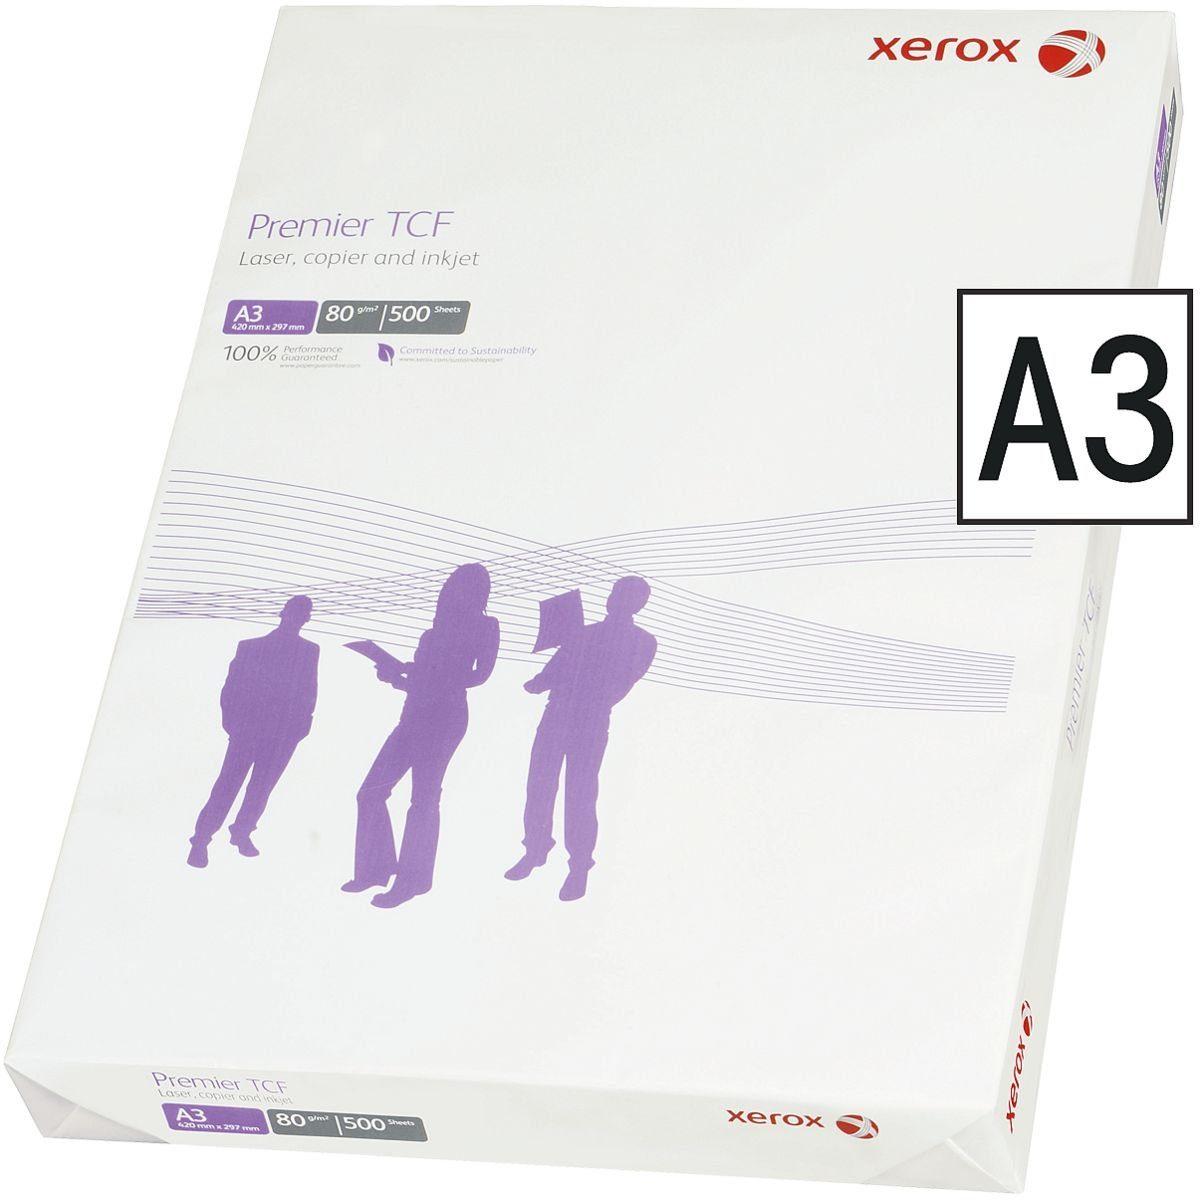 Xerox Multifunktionales Druckerpapier »Premier TCF«